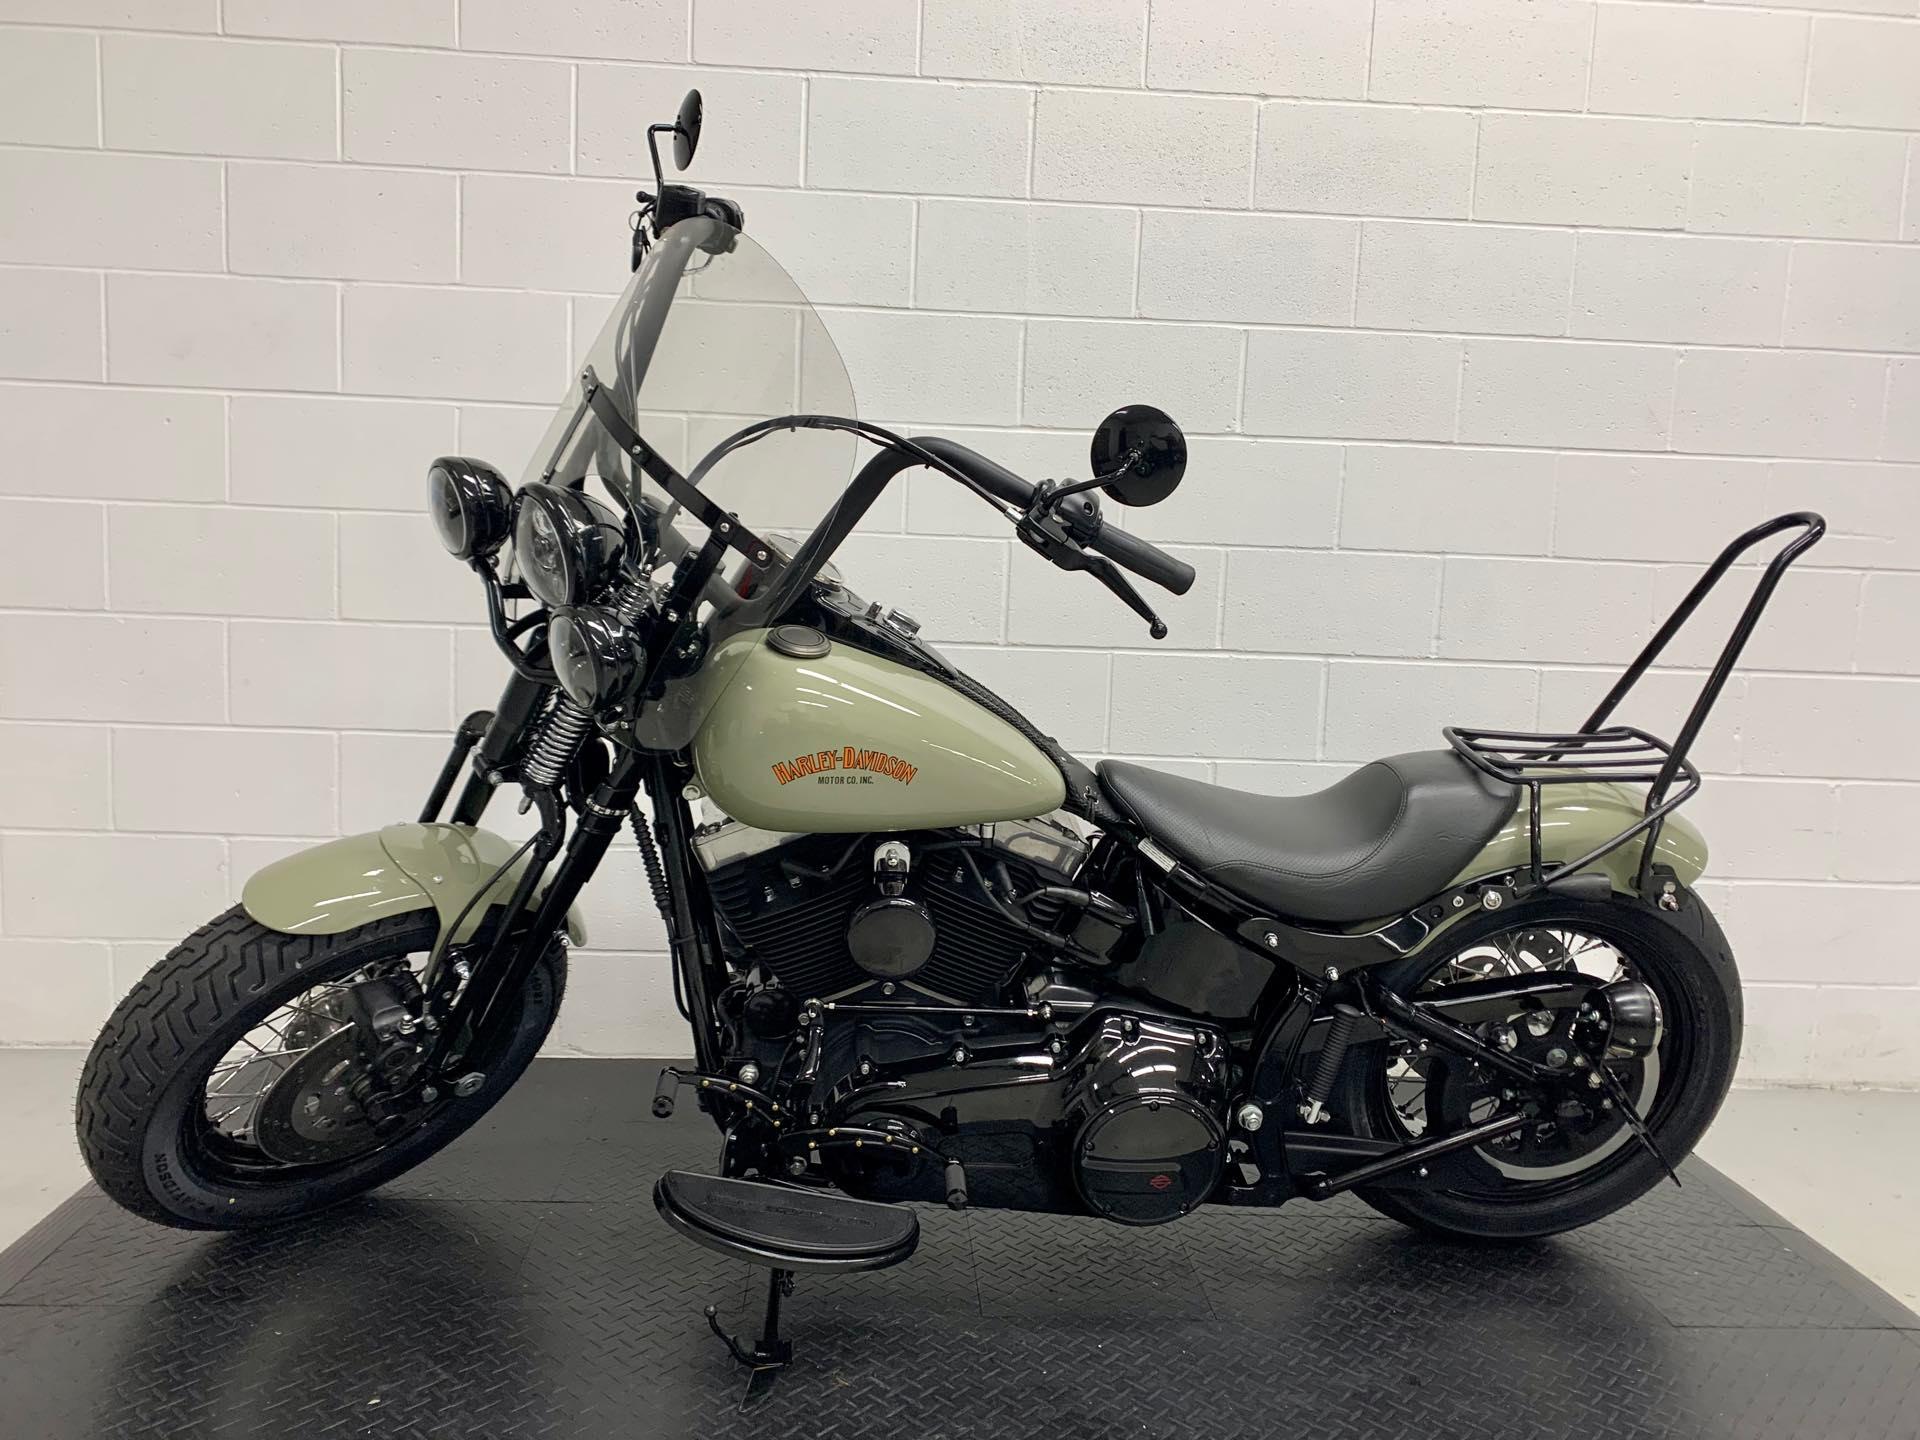 2009 Harley-Davidson Softail Cross Bones at Destination Harley-Davidson®, Silverdale, WA 98383